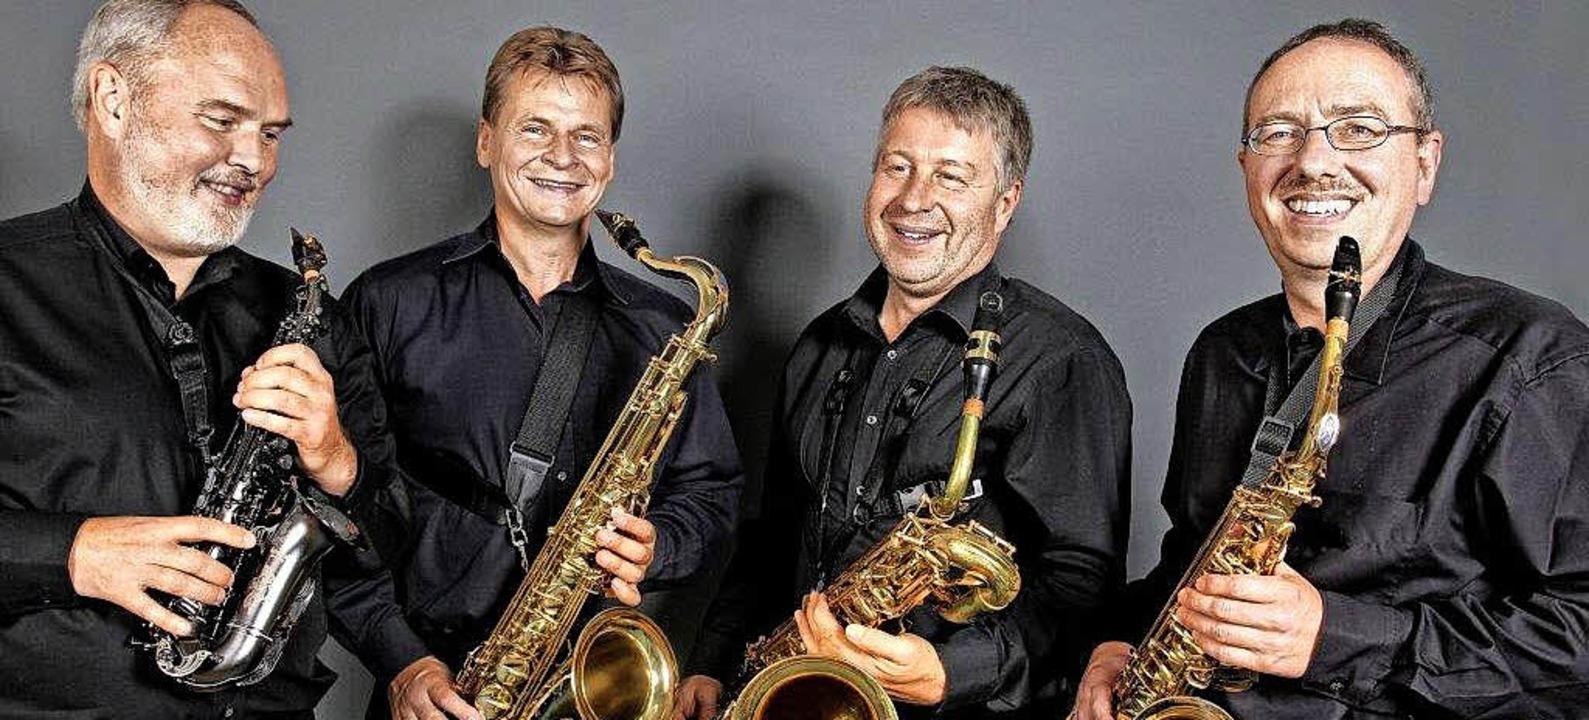 Das Subito Saxofon Quartett spielt in Fischingen.  | Foto: privat